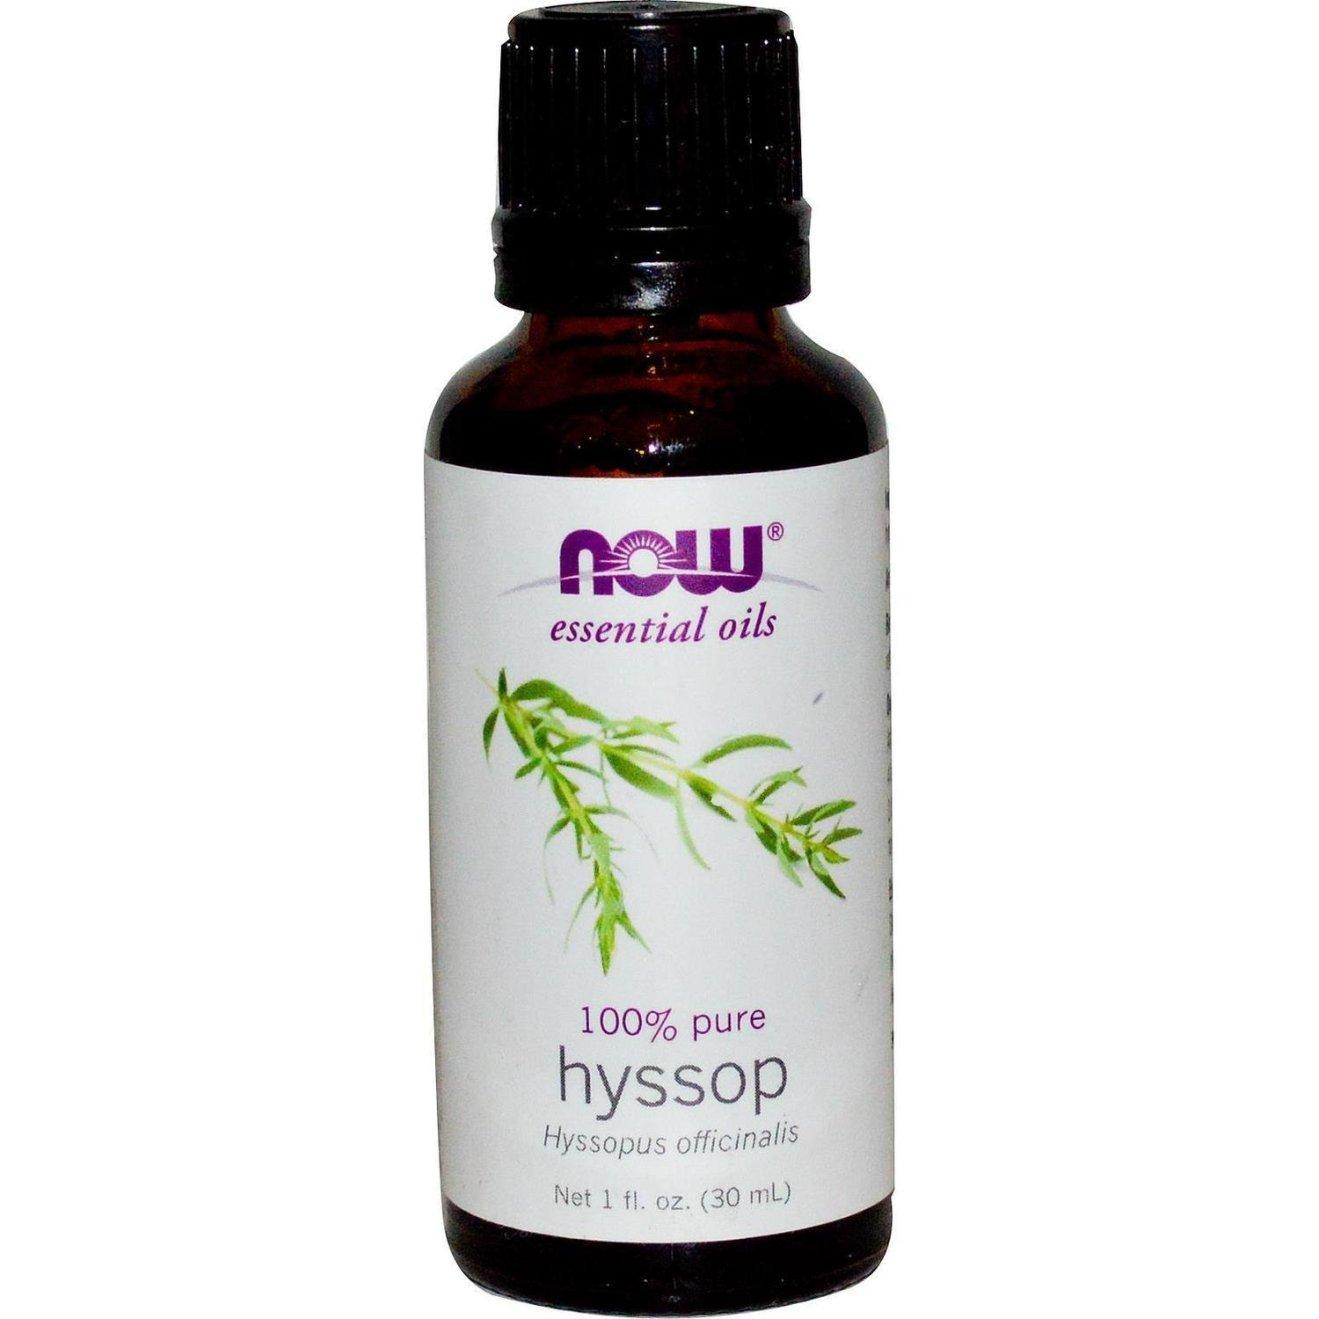 Now Essential Oils - Hyssop 100% Pure Oils 1 fl.oz